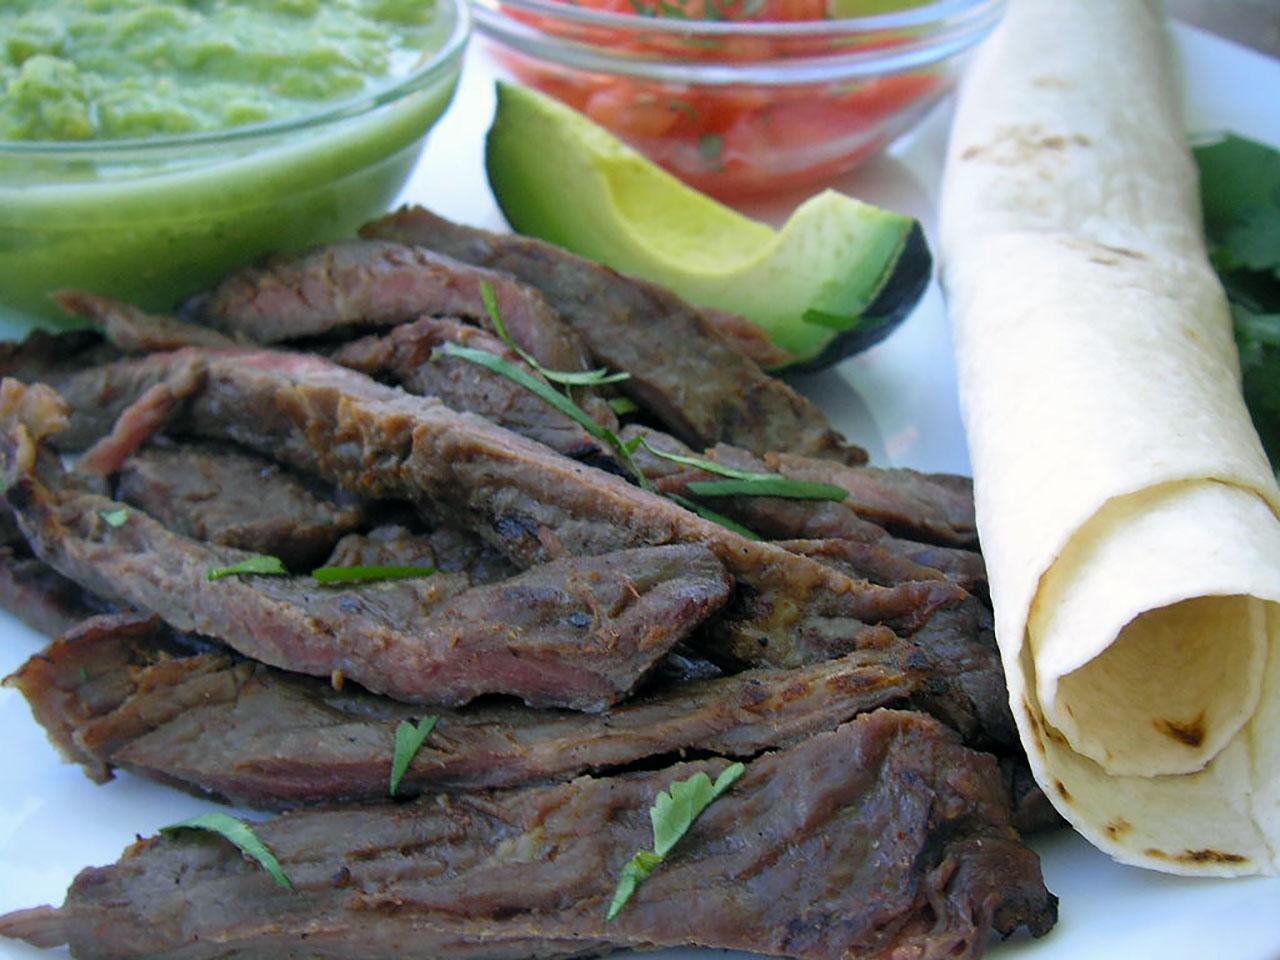 Taqueria Style Tacos - Carne Asada